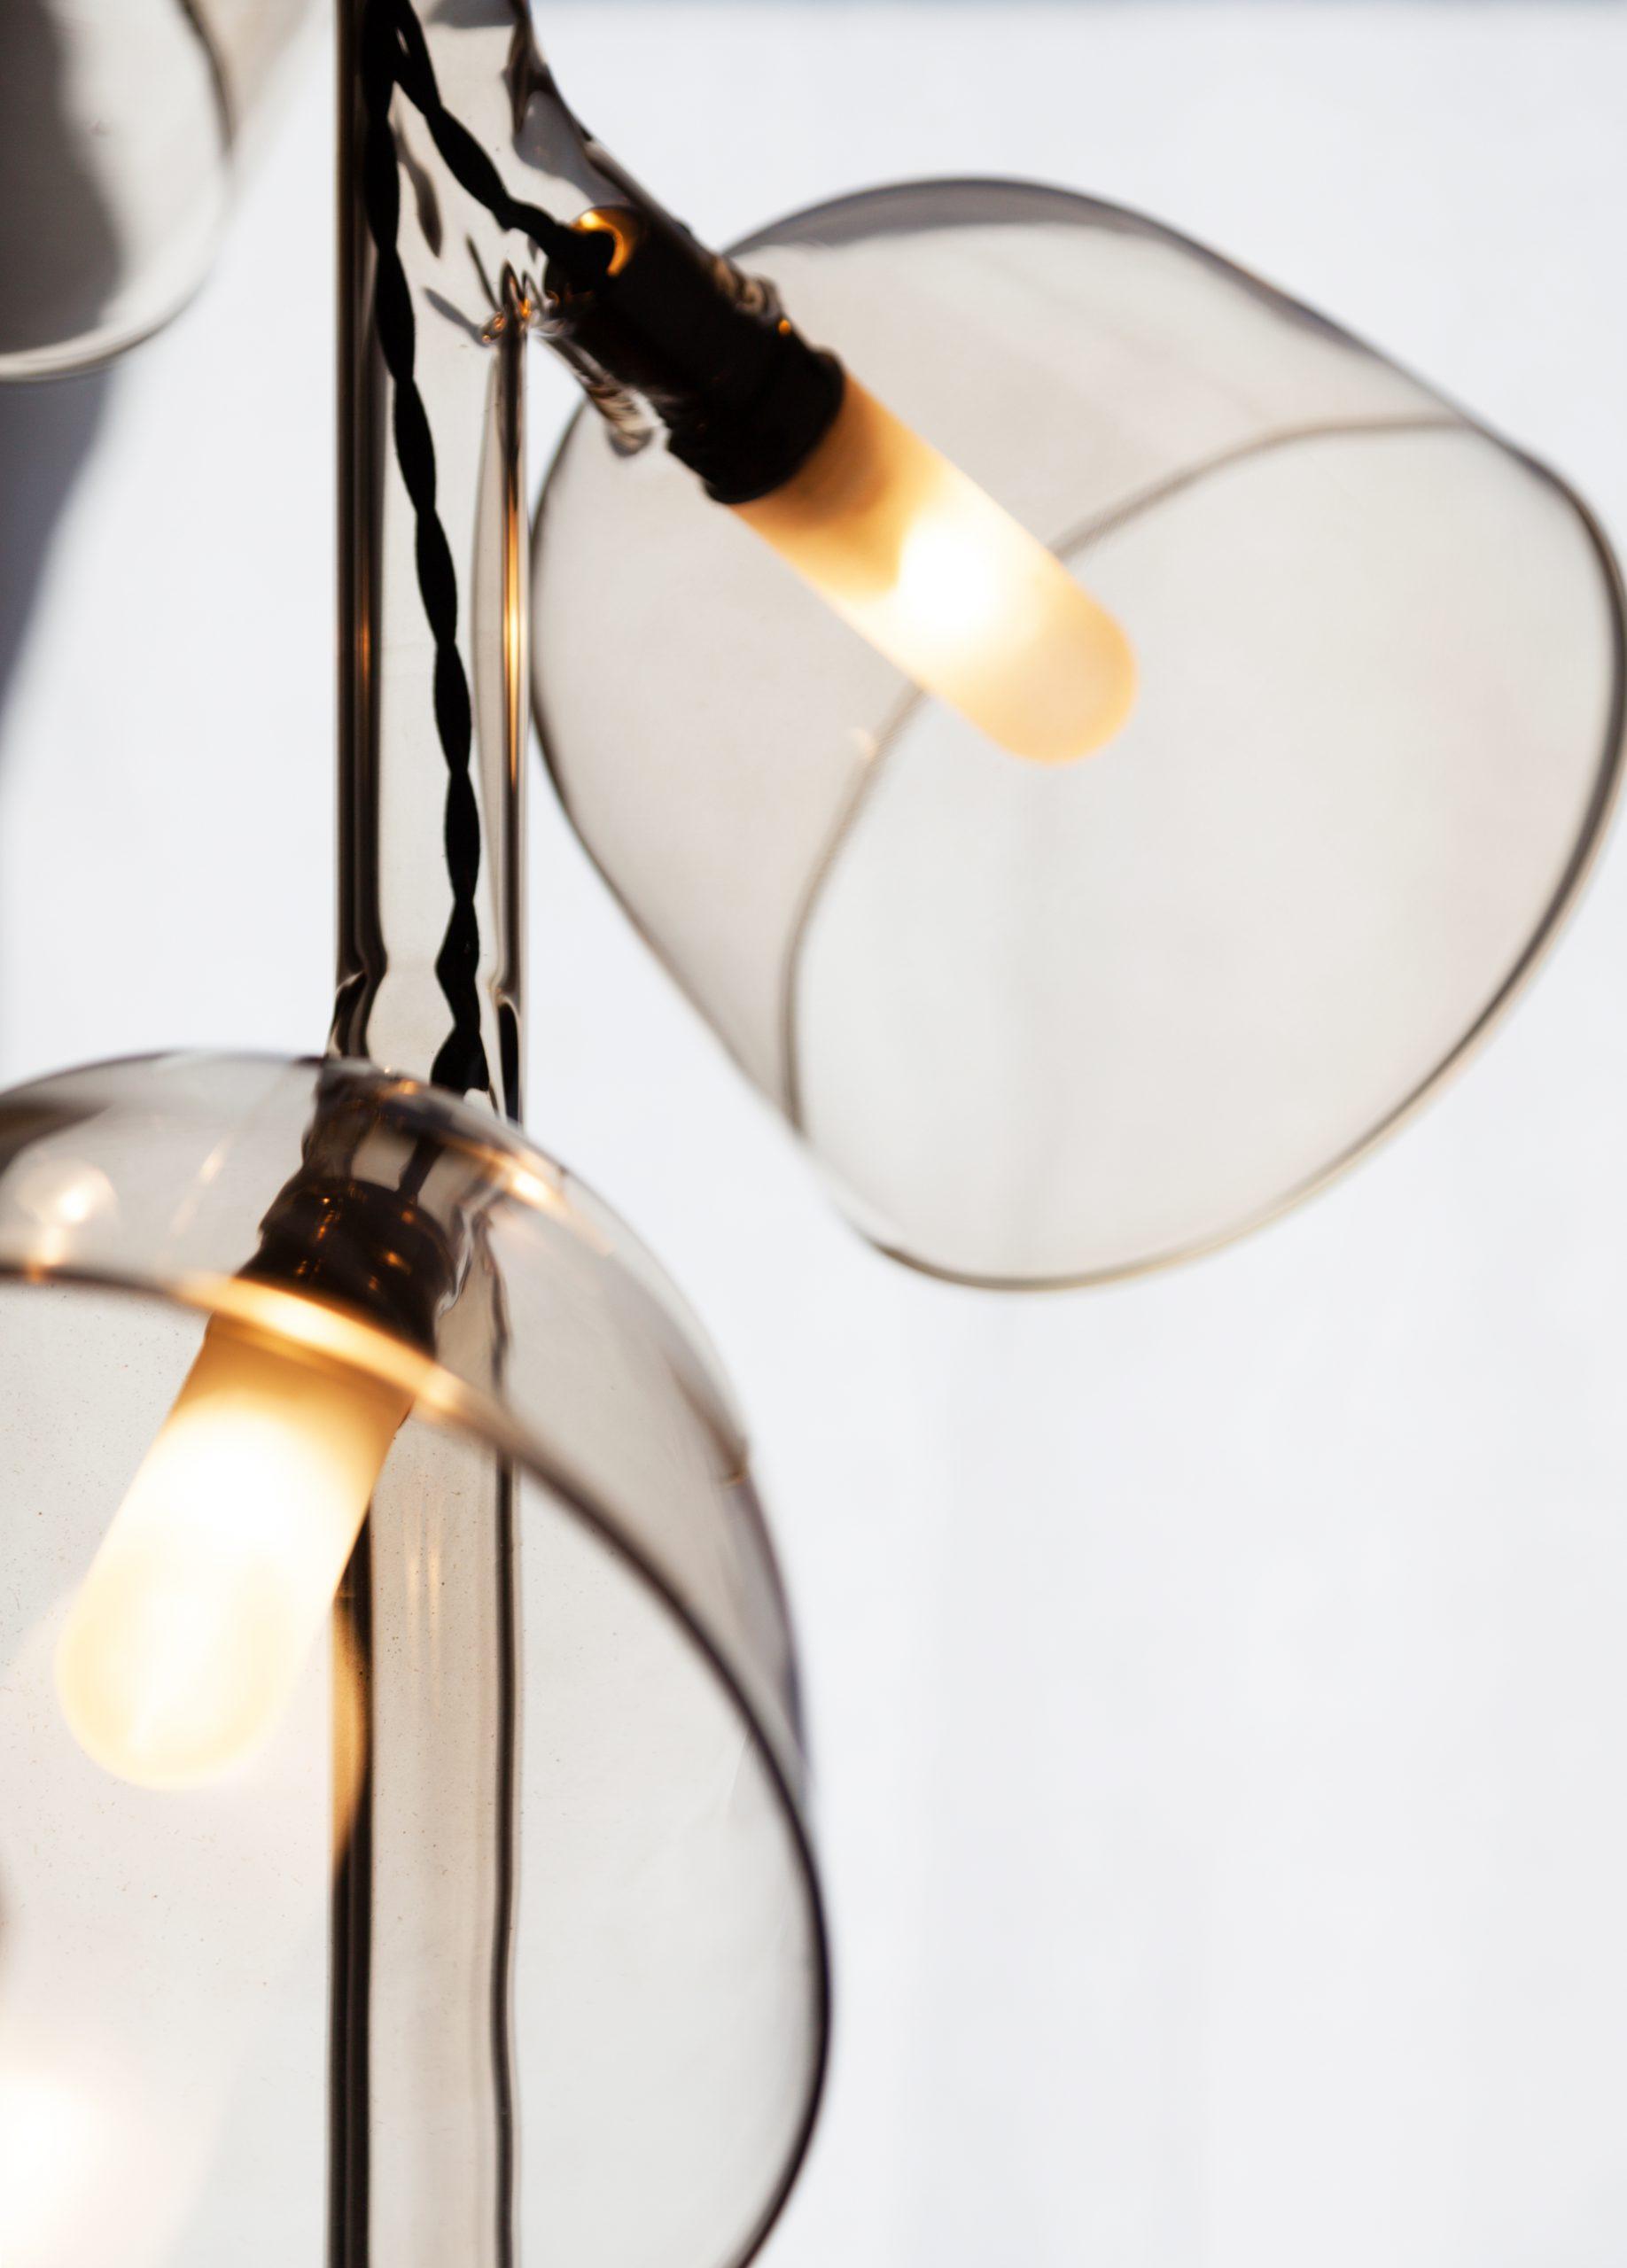 Detail of the Labo pendant lamp bu Debiasi Sandri for Penta